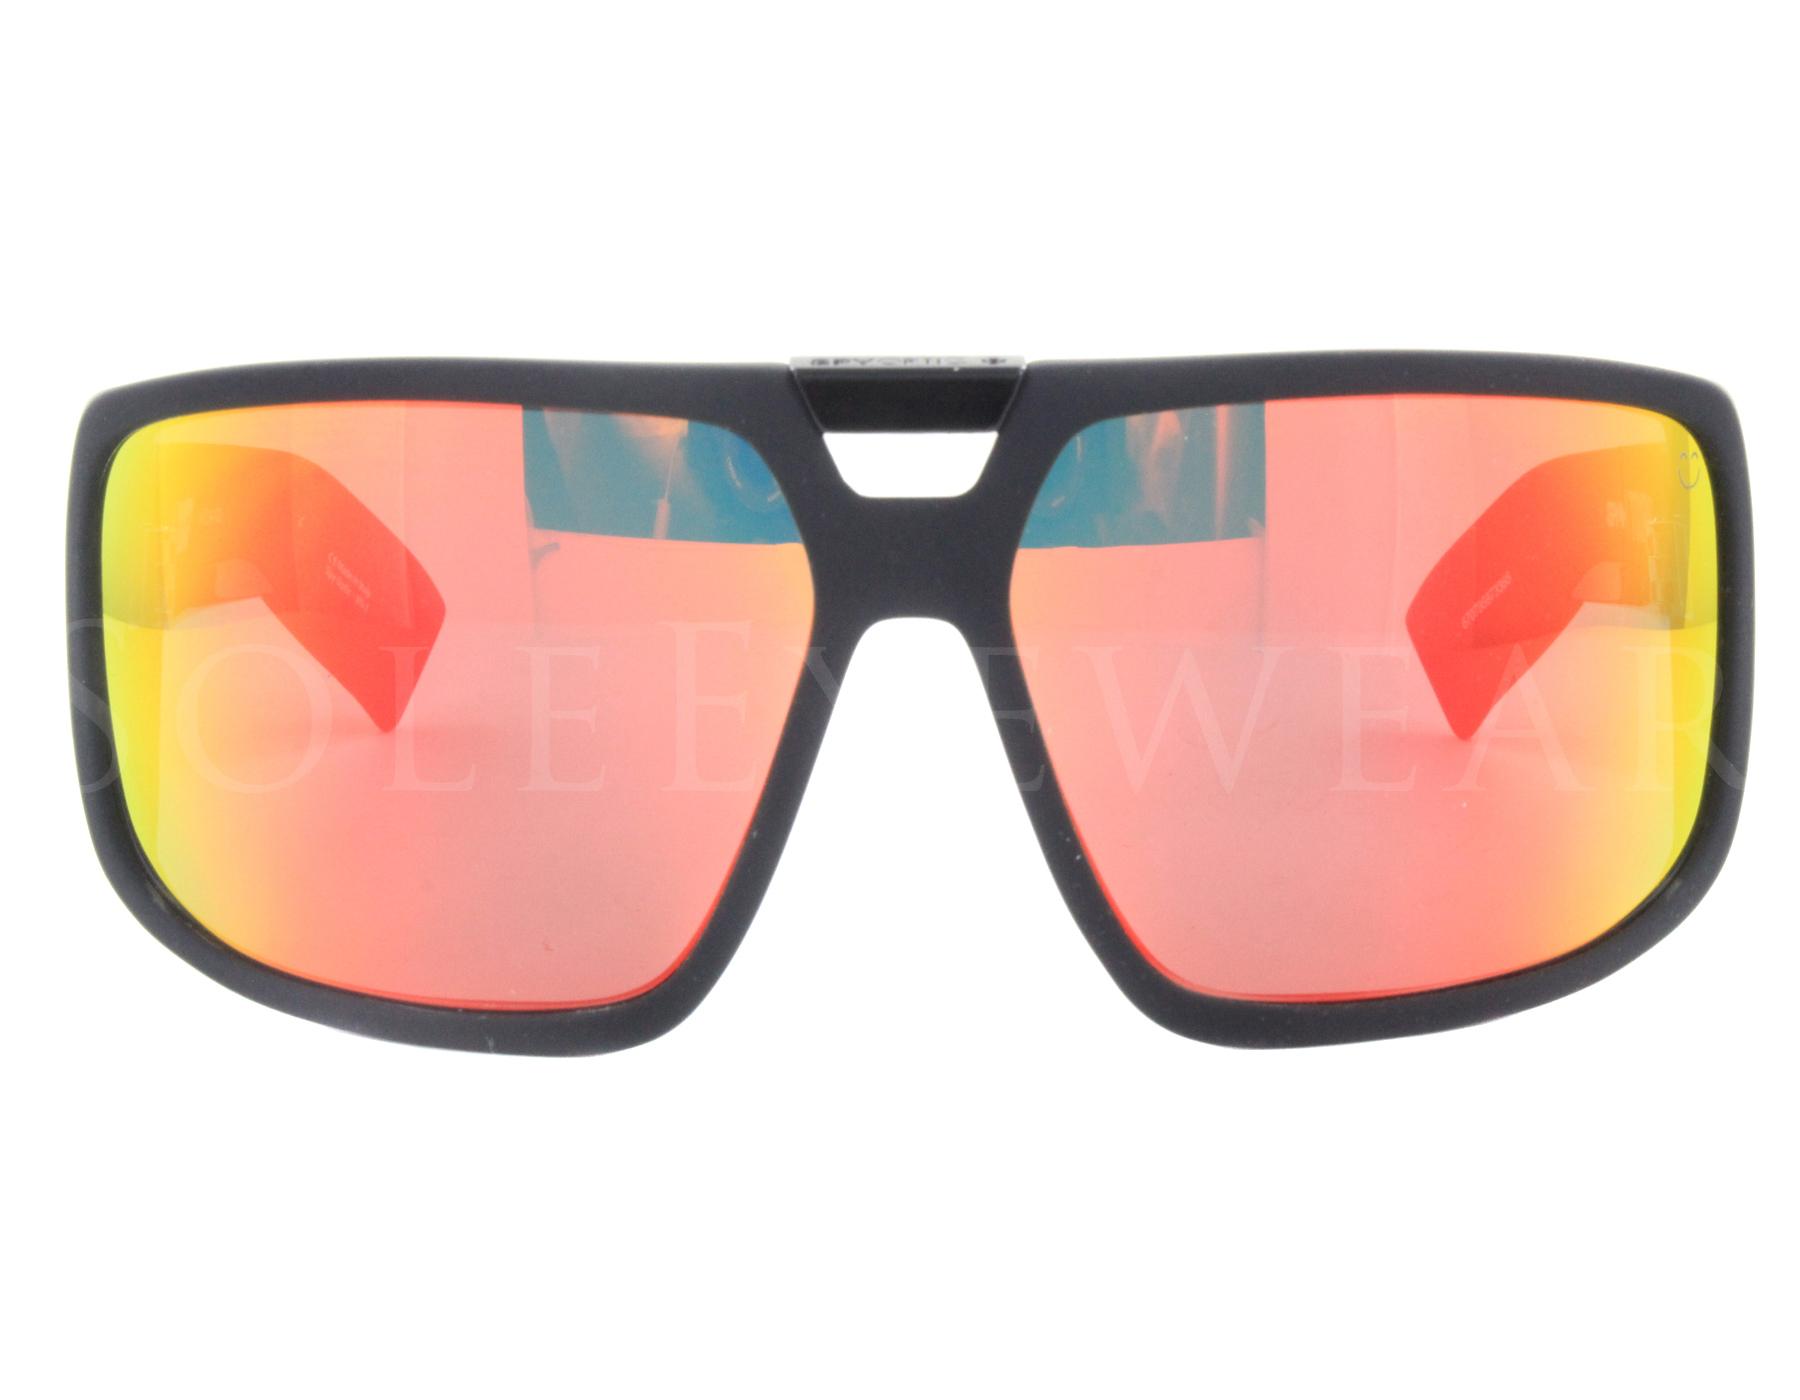 Spy Sunglasses Touring Puerto Rico